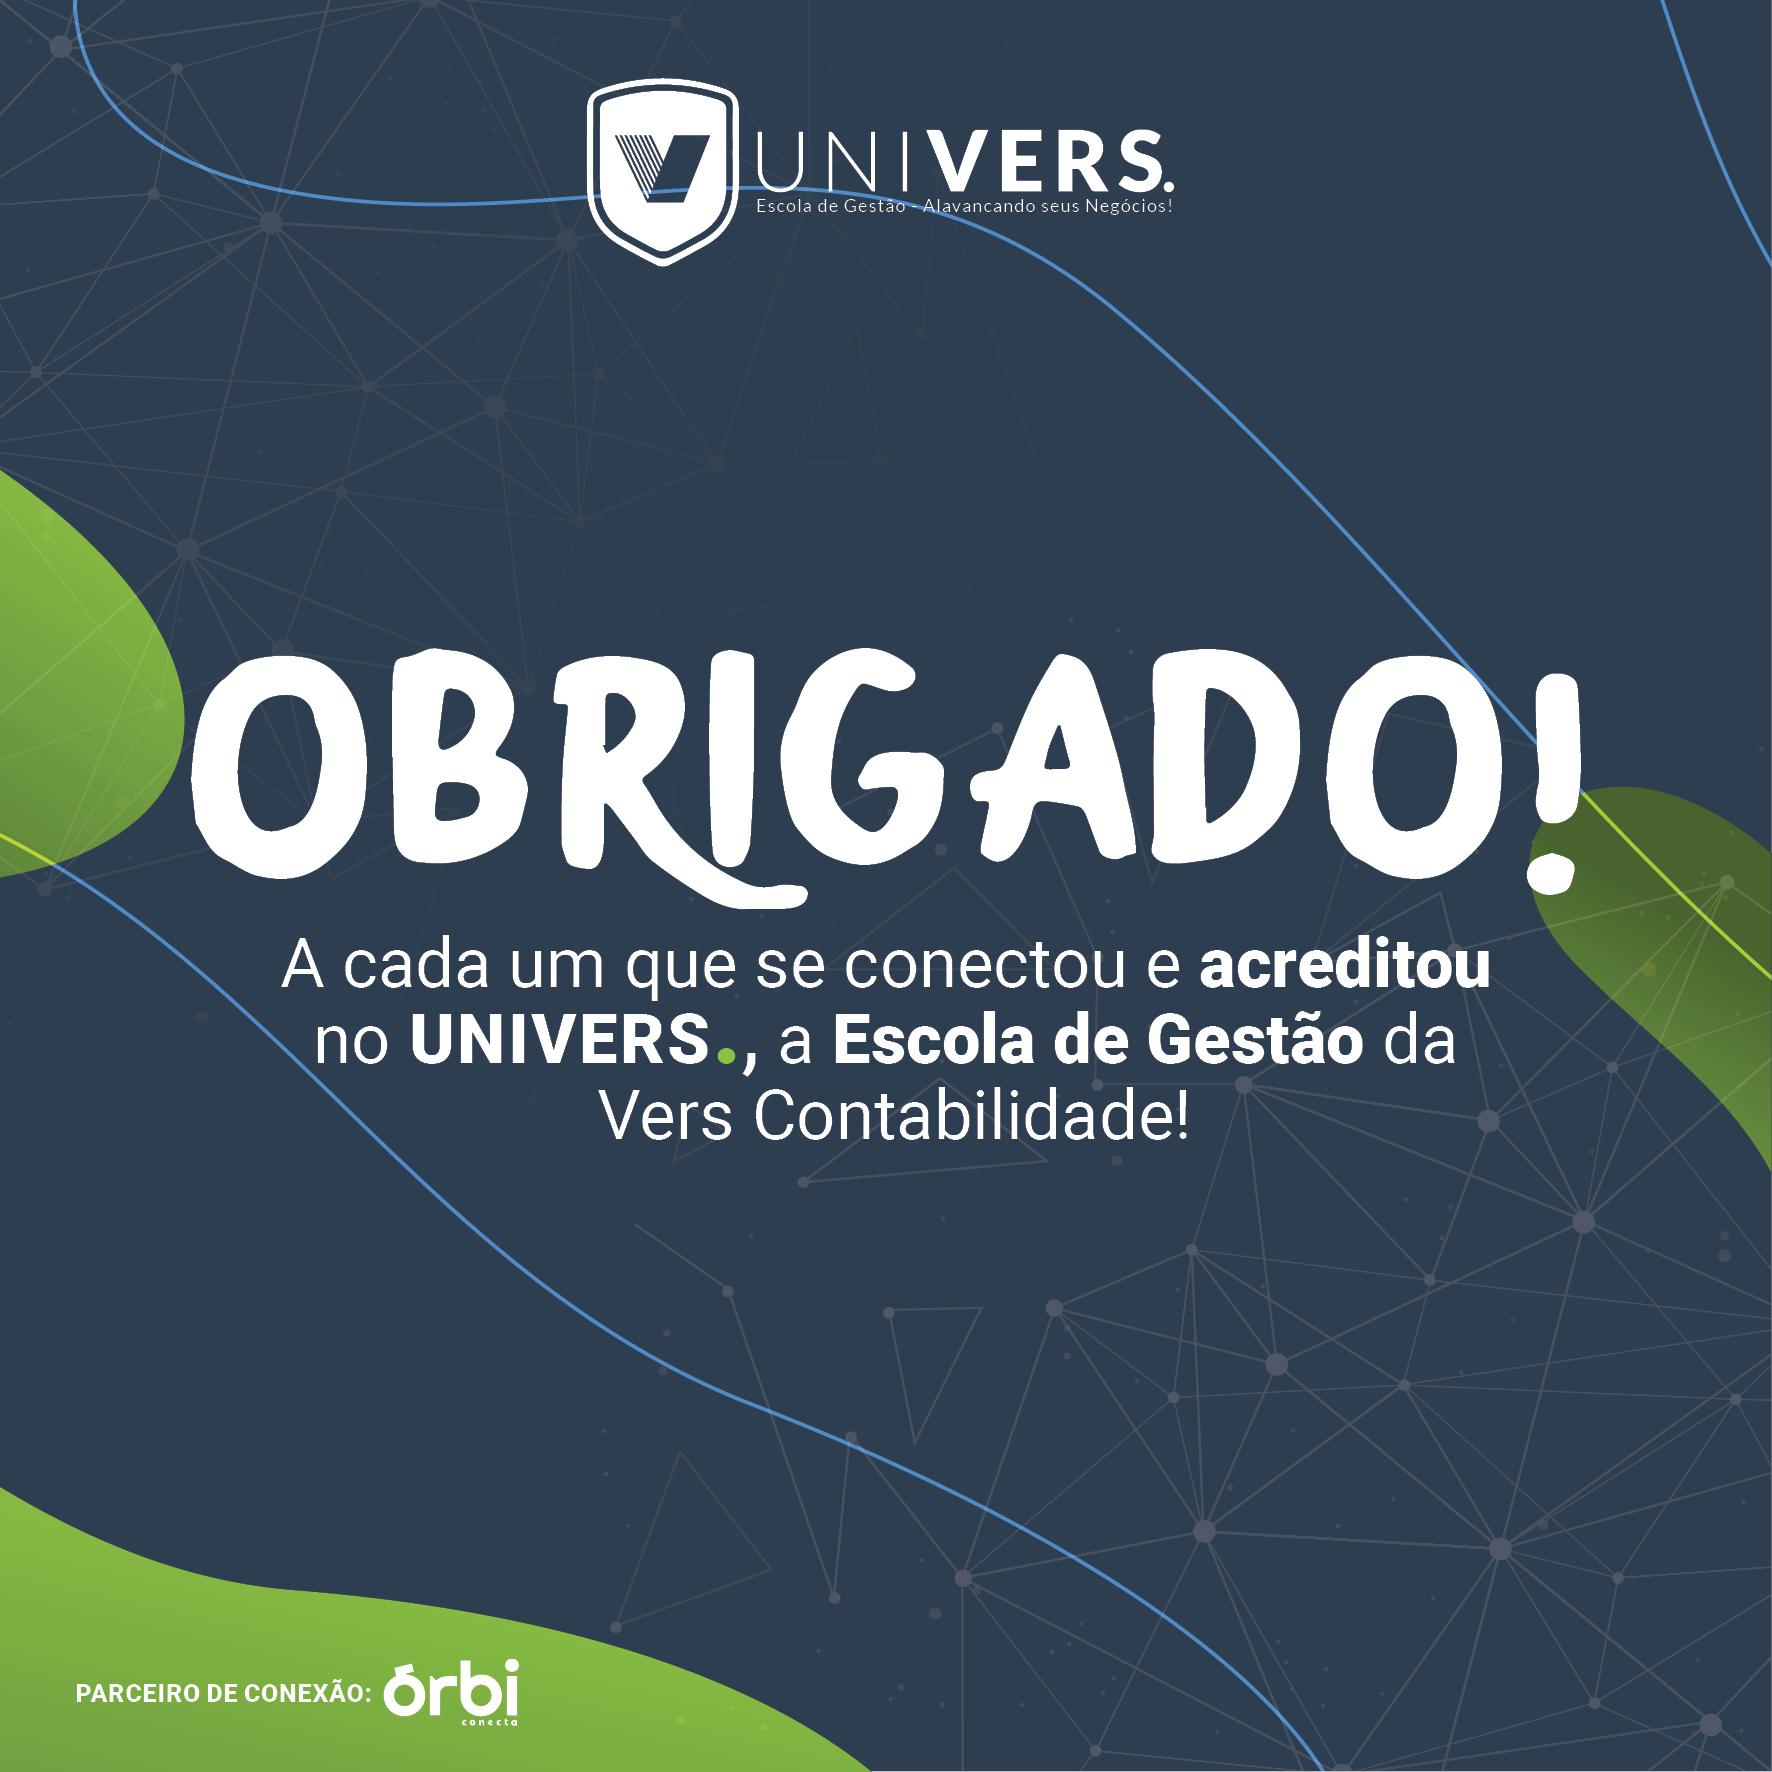 UNIVERS.